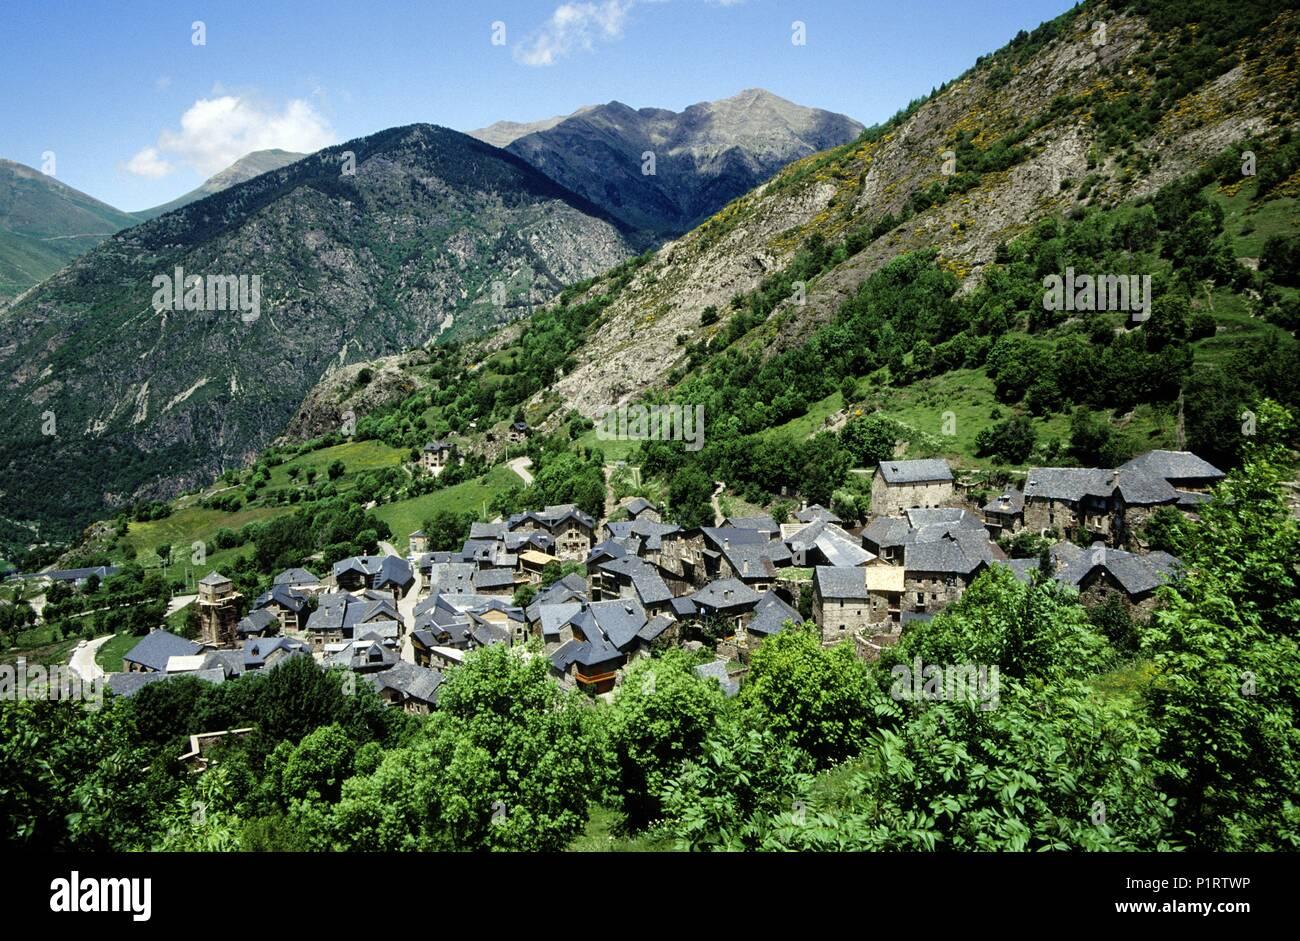 Alta Ribagorça: Durró, view of the town and mountain landscape (Alta Ribagorça). - Stock Image